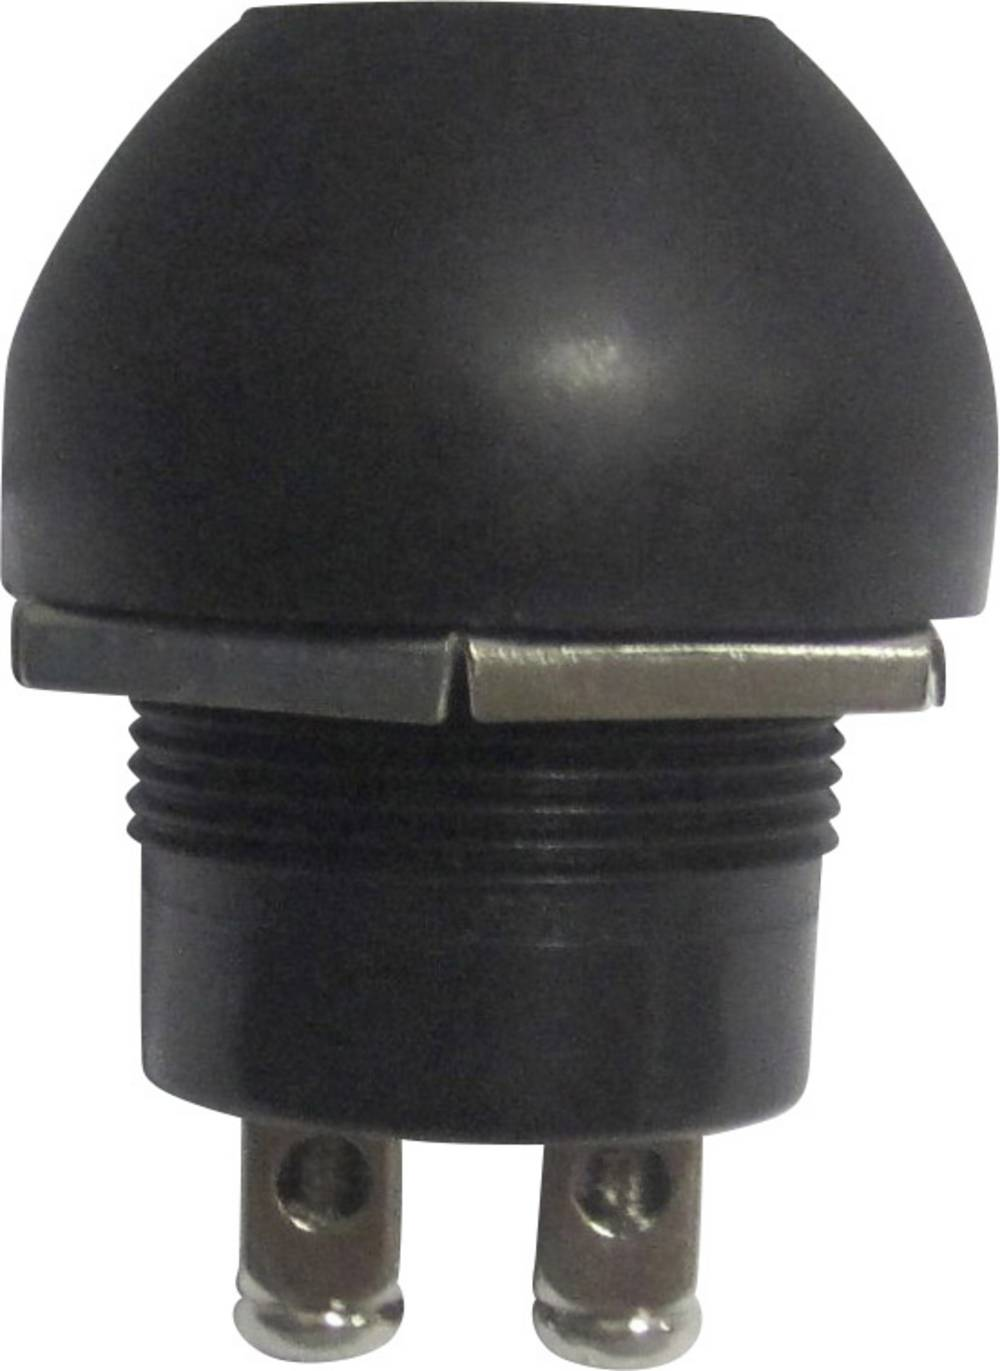 SCI Automobil-trykknap 24 V/DC 10 A A2-5B Fra/(til)